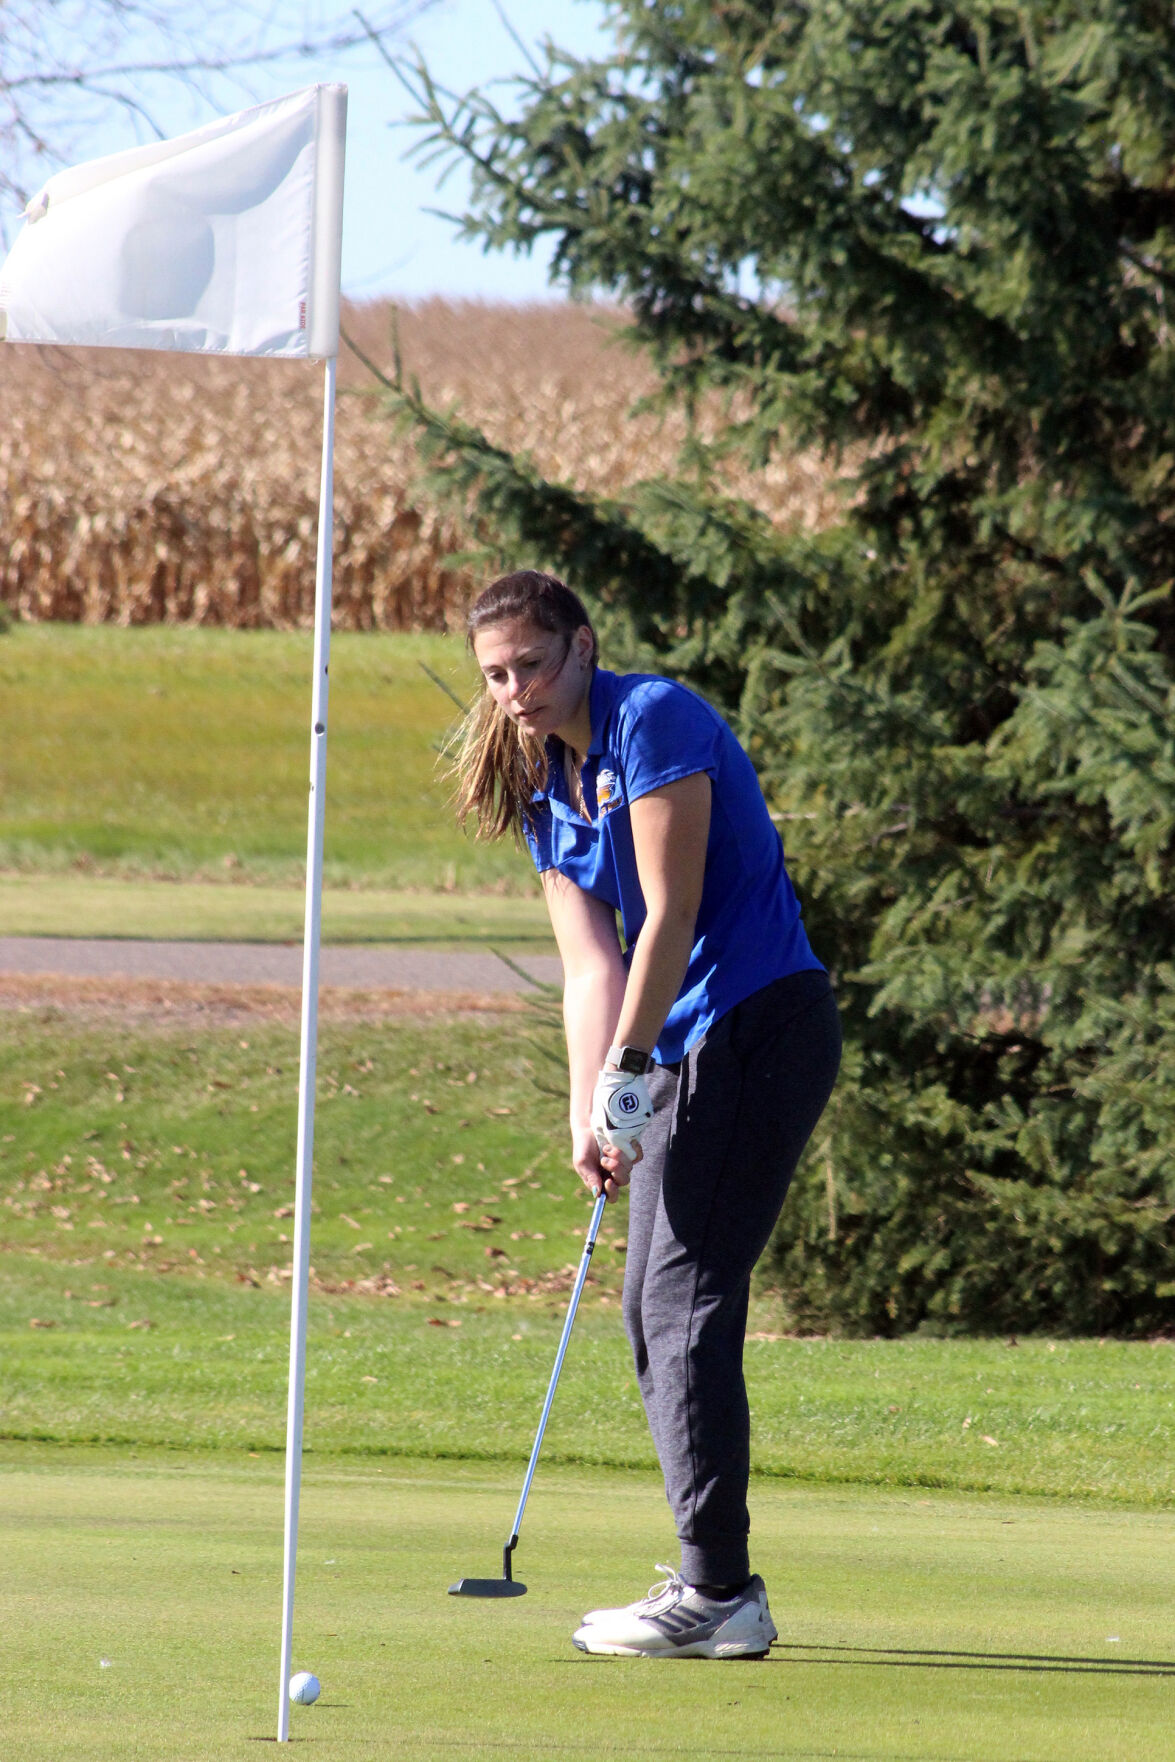 Division 2 girls golf sectional at Rice Lake 10-7-20